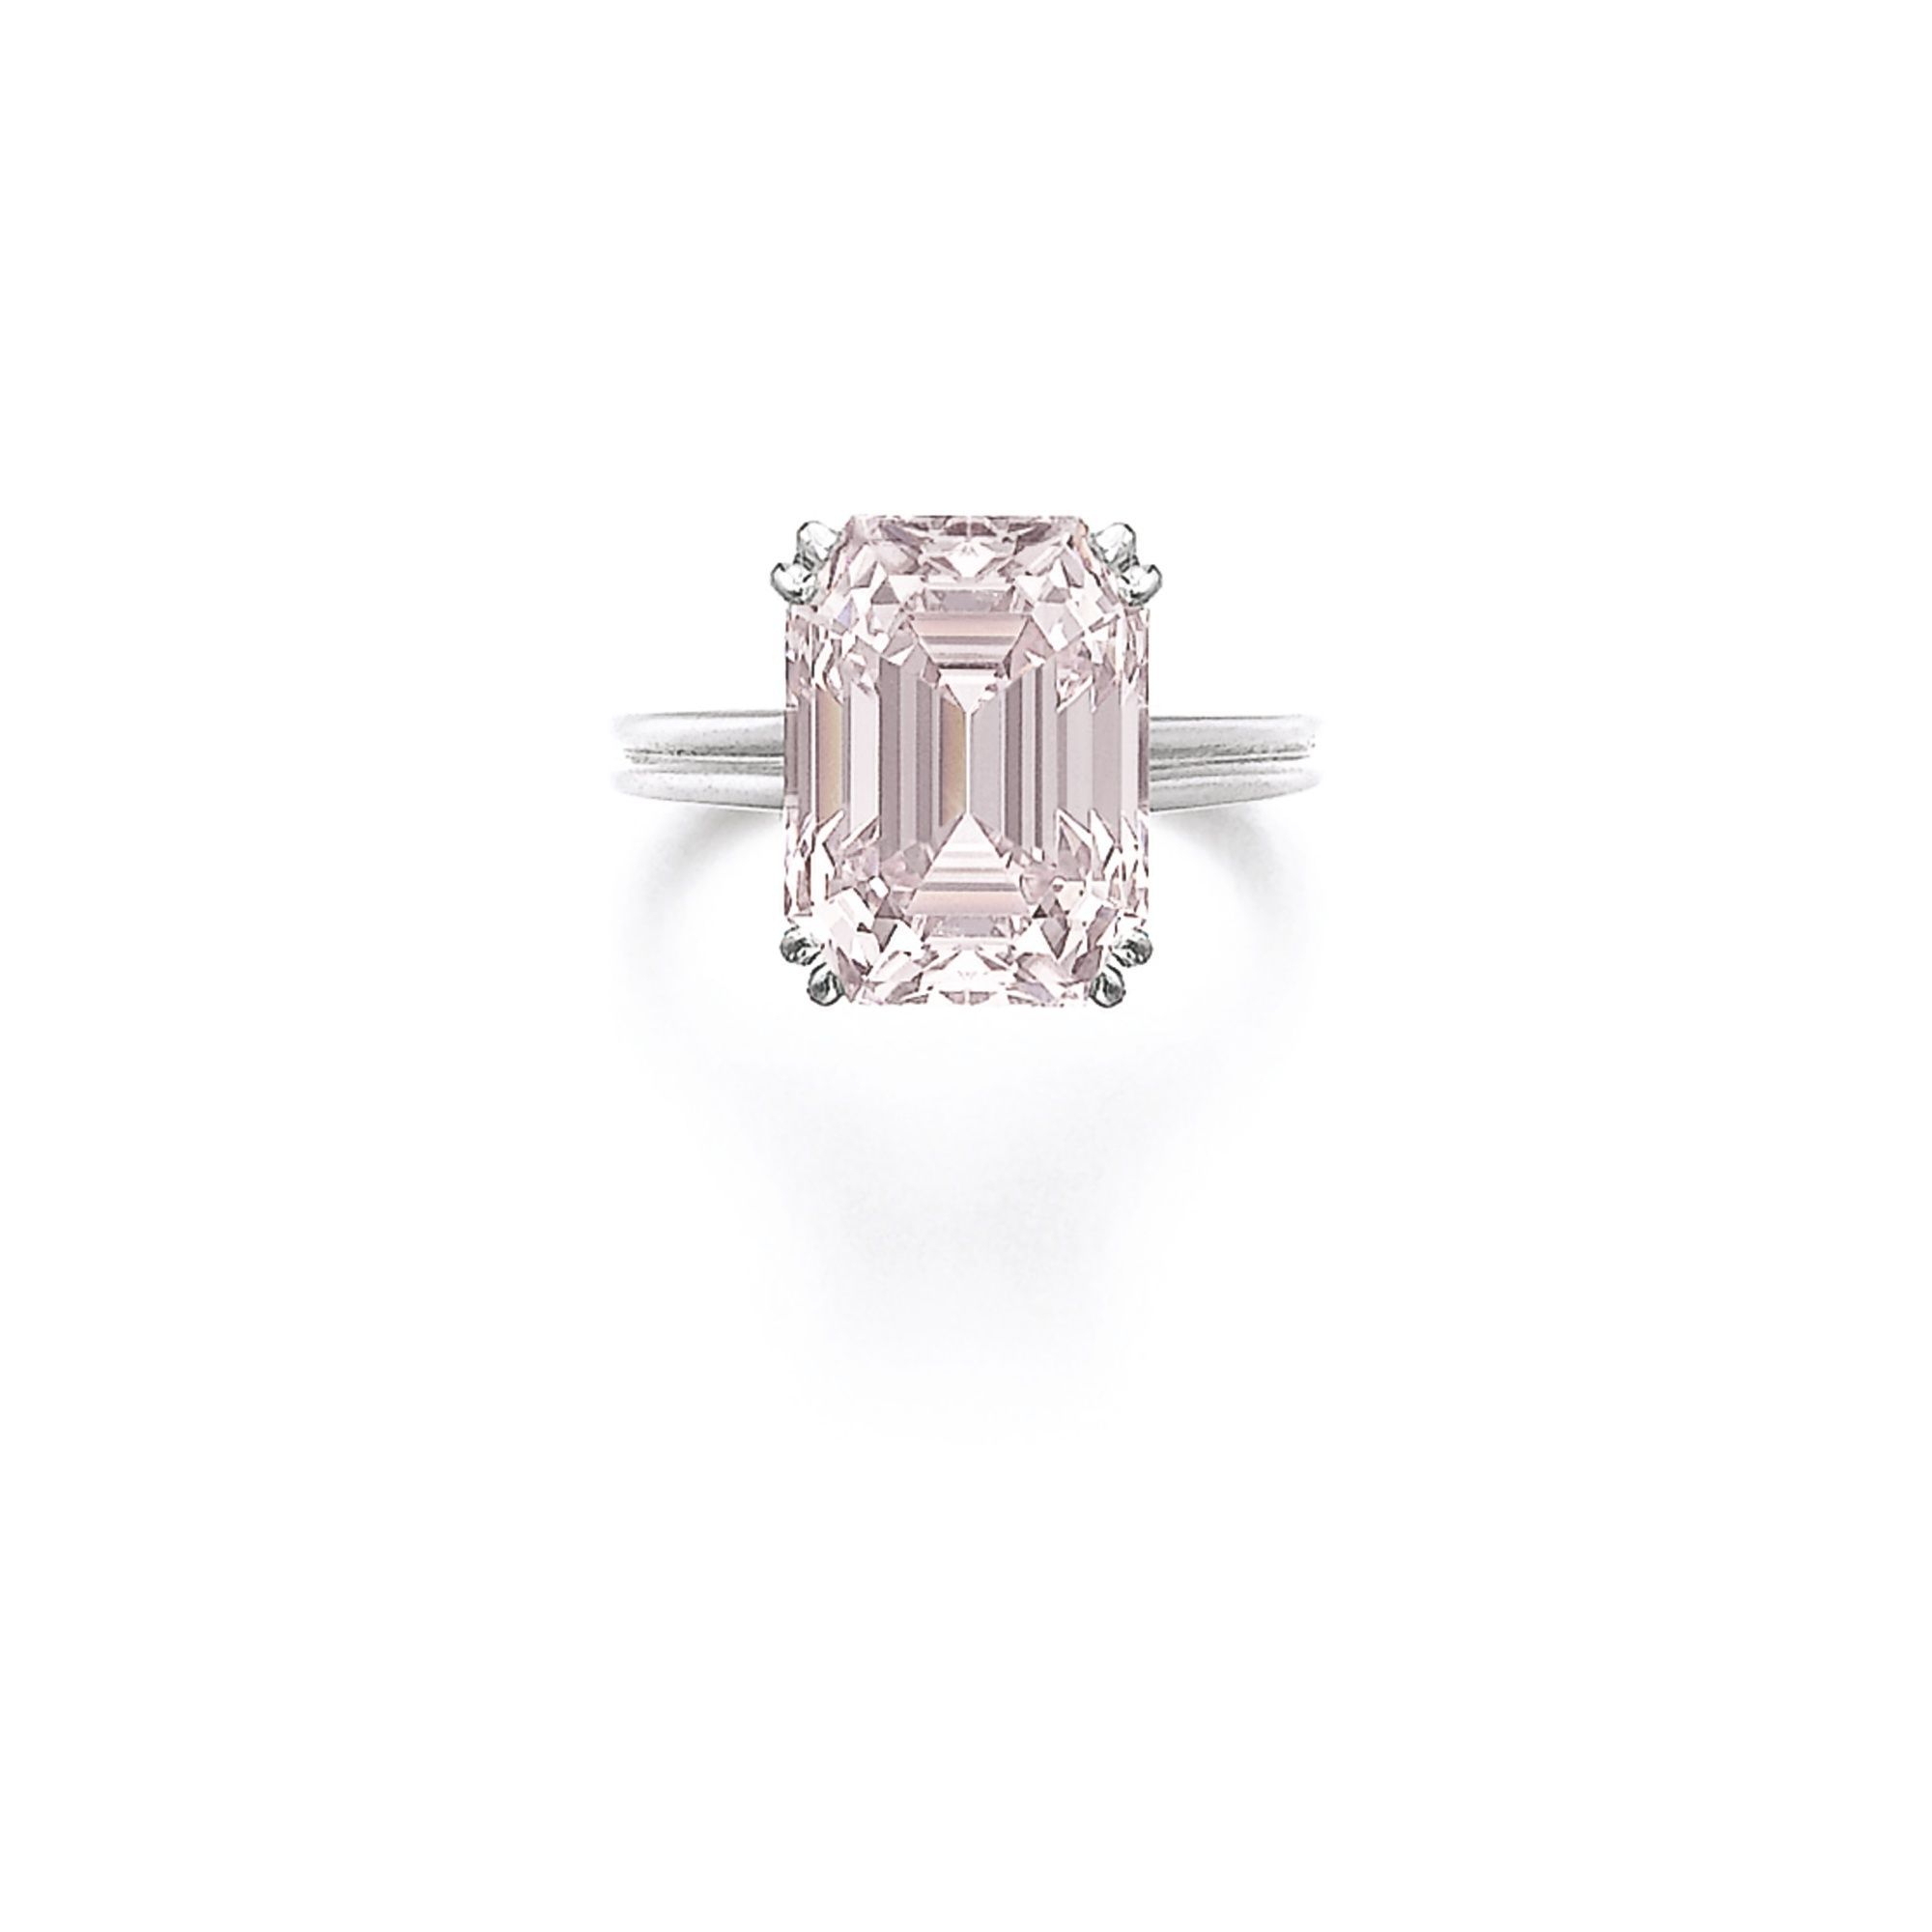 Fancy intense pink diamond ring set with a stepcut fancy intense